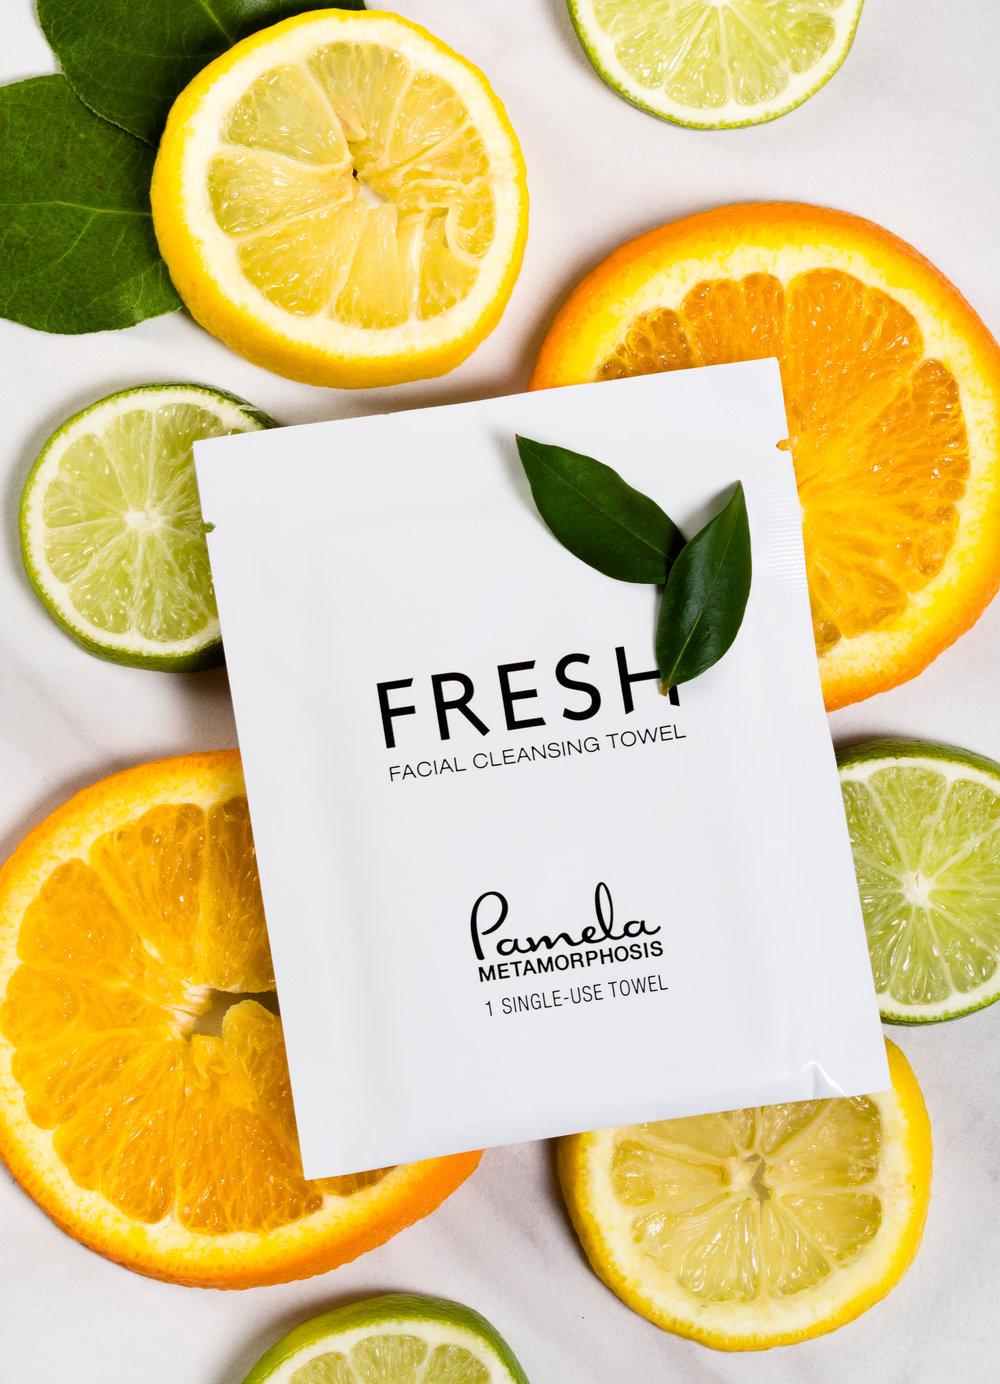 pamela metamorphosis makeup remover towels